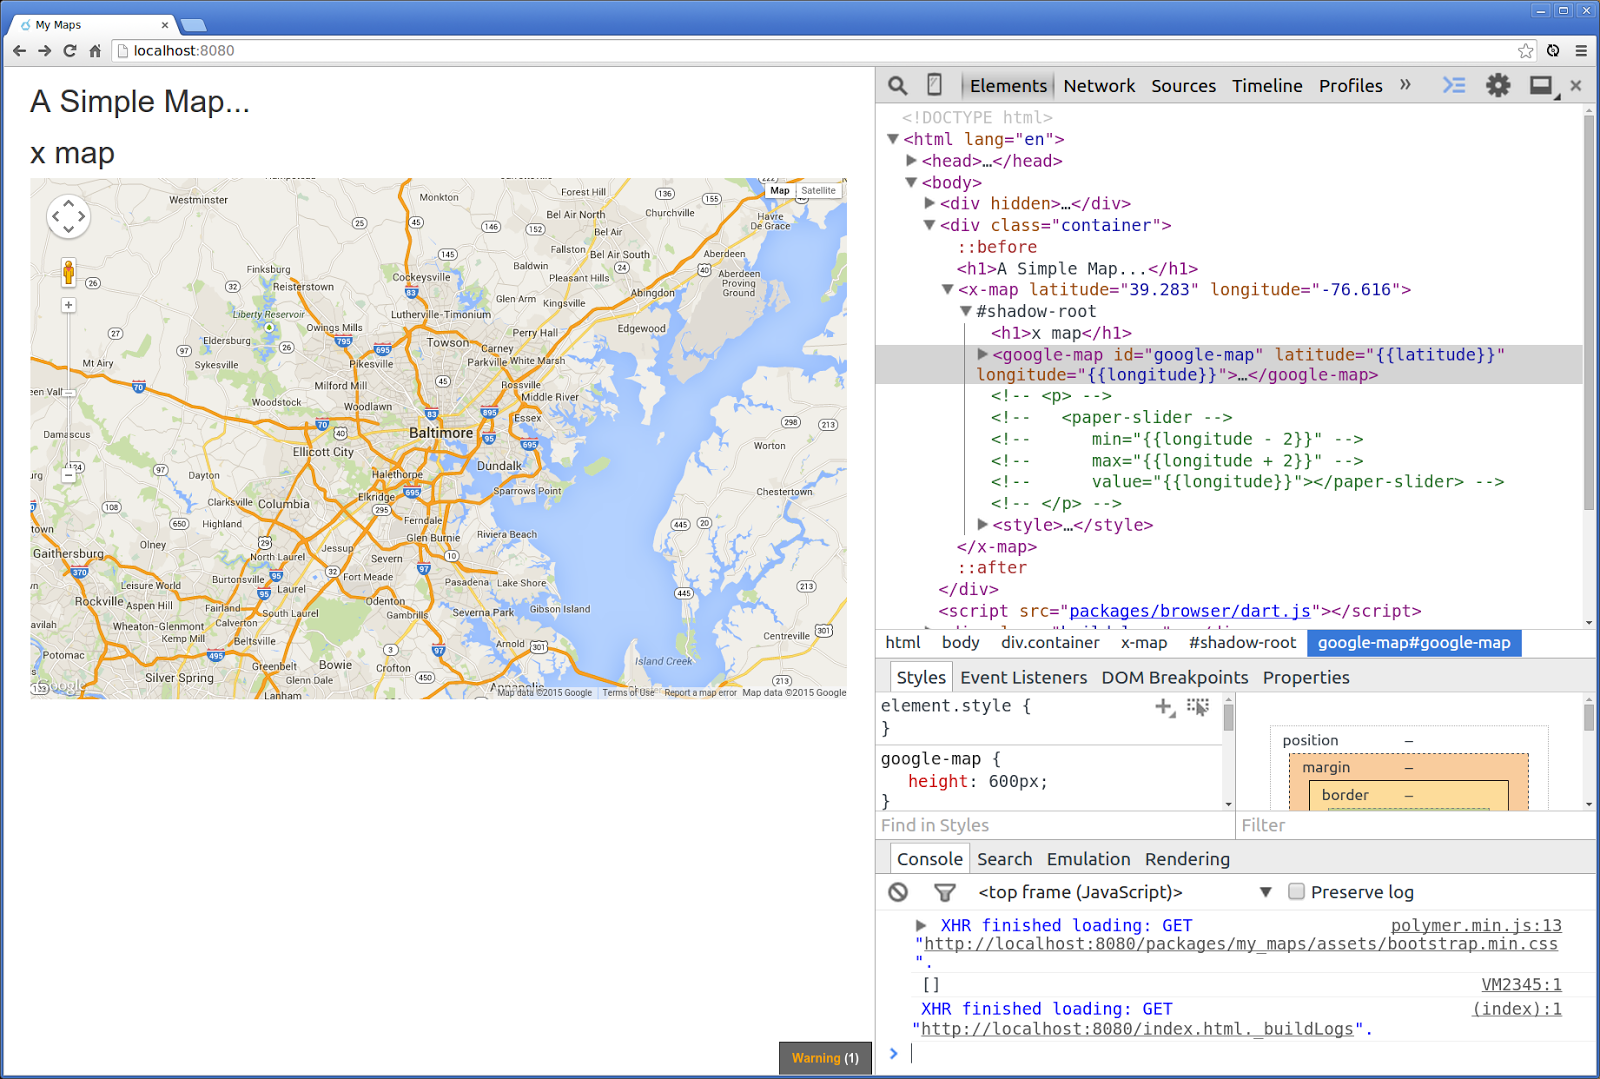 Japhr By Chris Strom Adopting Googlemapmarker Children In - Map with latitude and longitude google